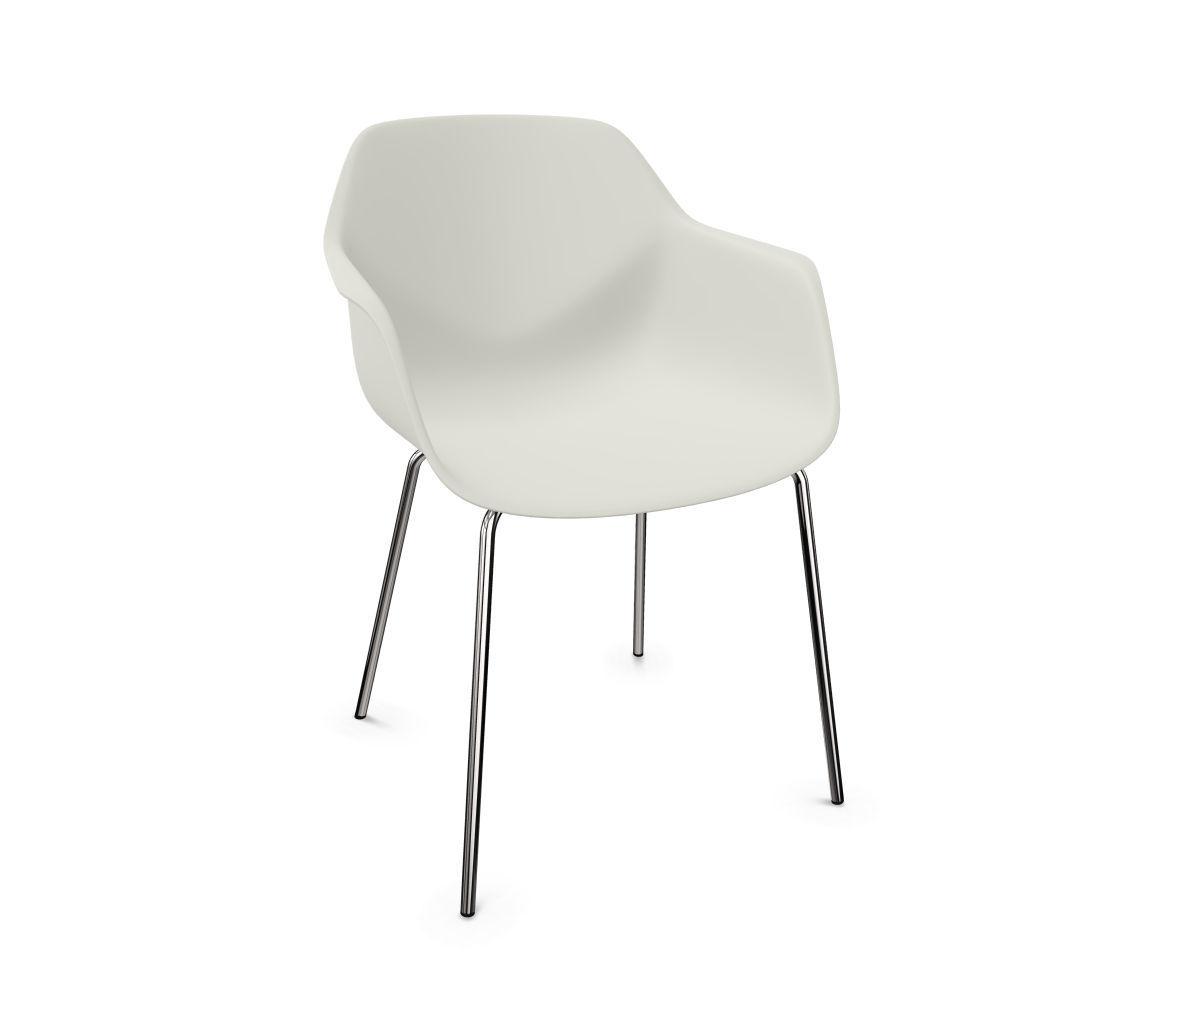 Moderner Stuhl Polster mit Armlehnen Holz FOURME®44